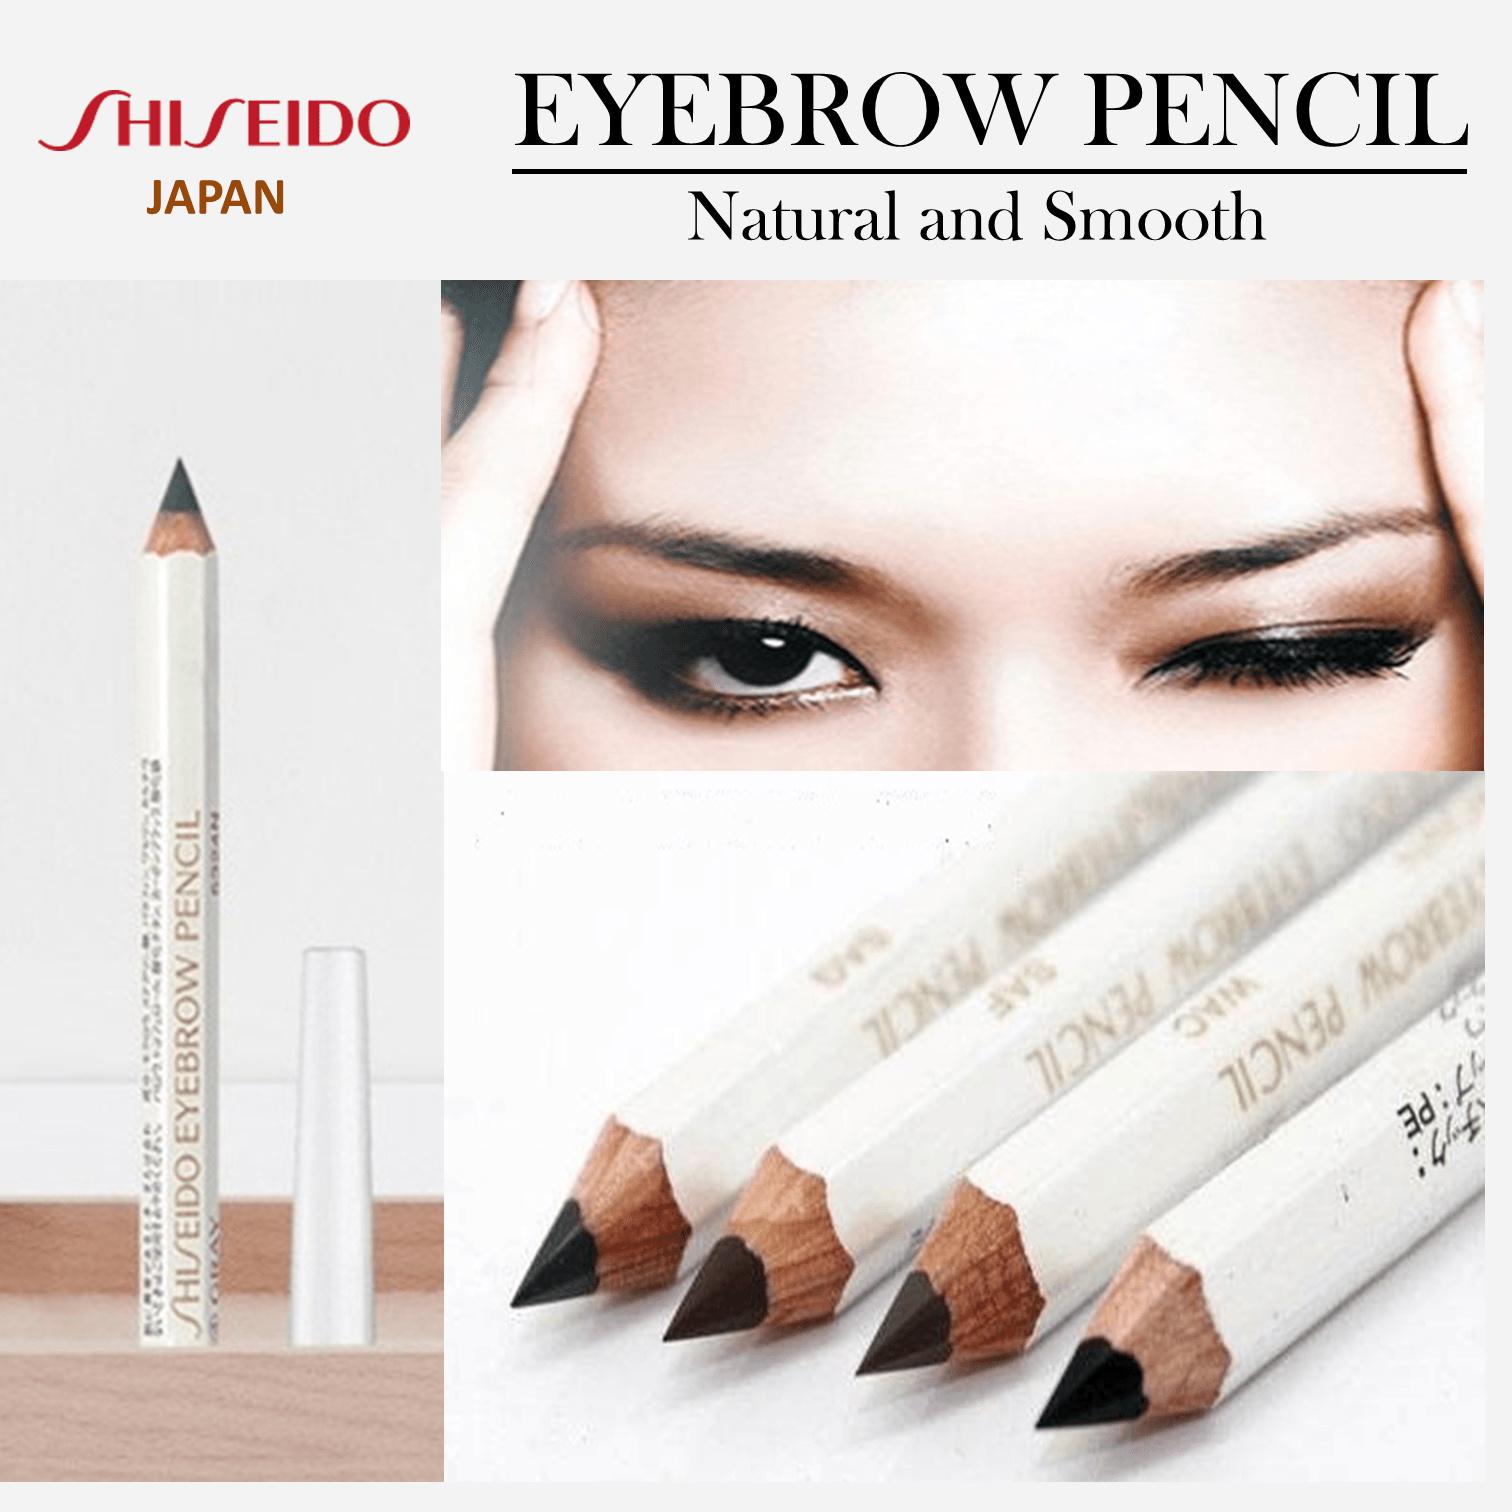 Qoo10 Shiseido Eyebrow Pencil Browndark Brownblackgrey 12g